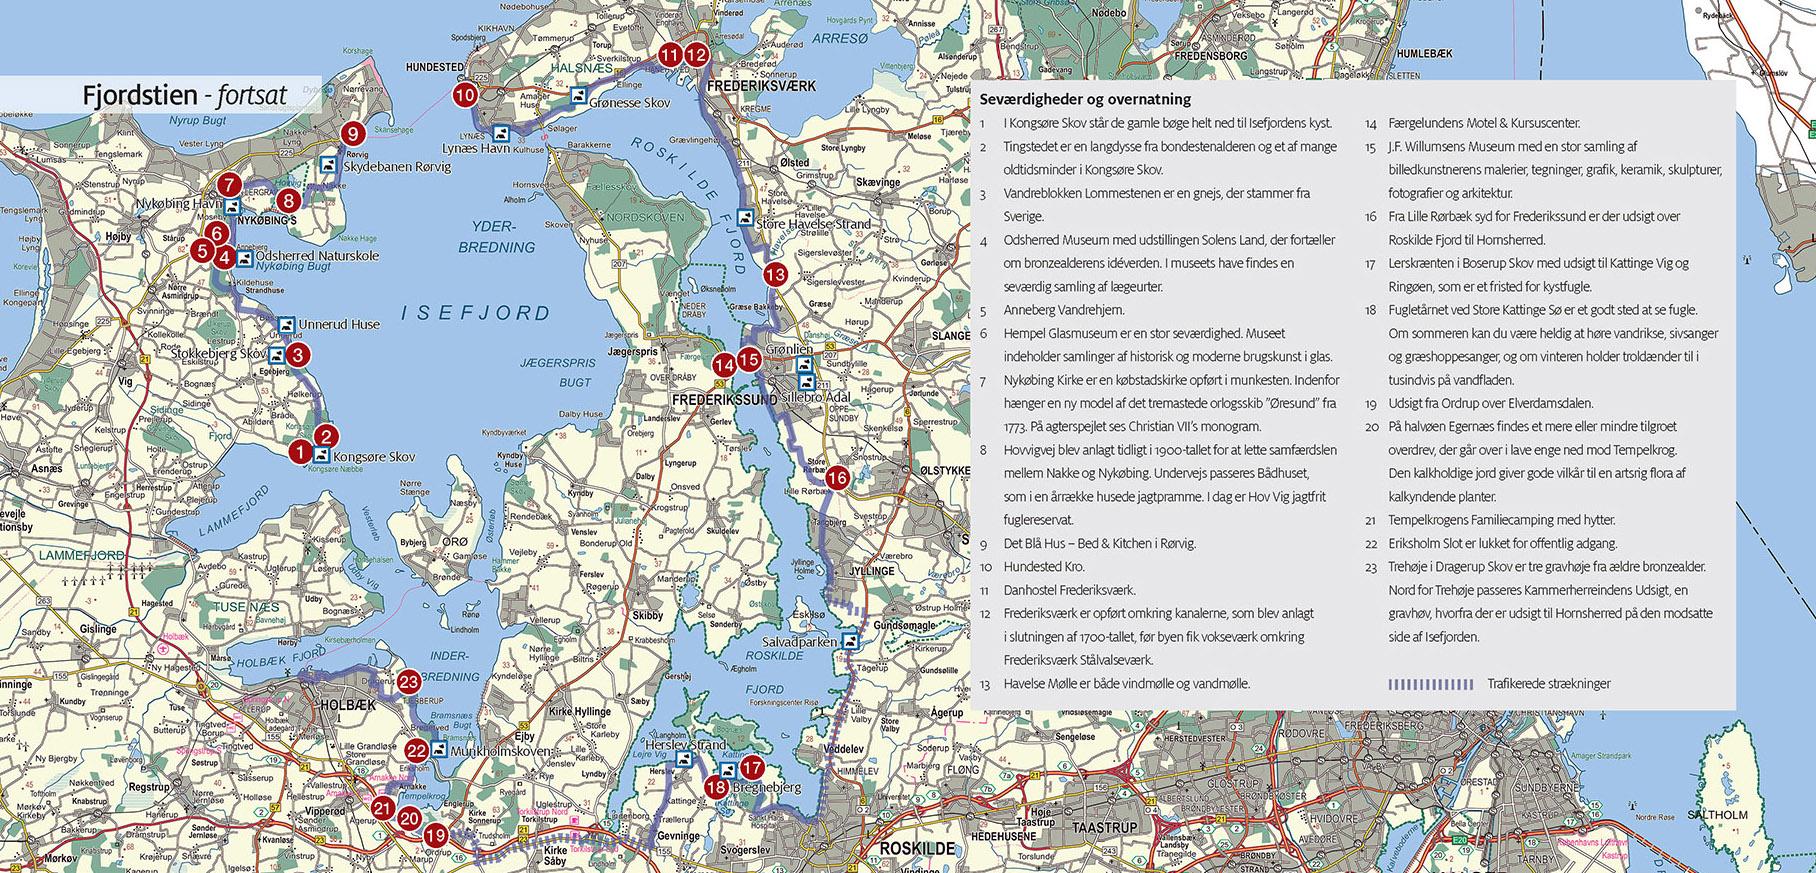 Fjordstien Vandring Vandreture Og Vandreruter I Danmark